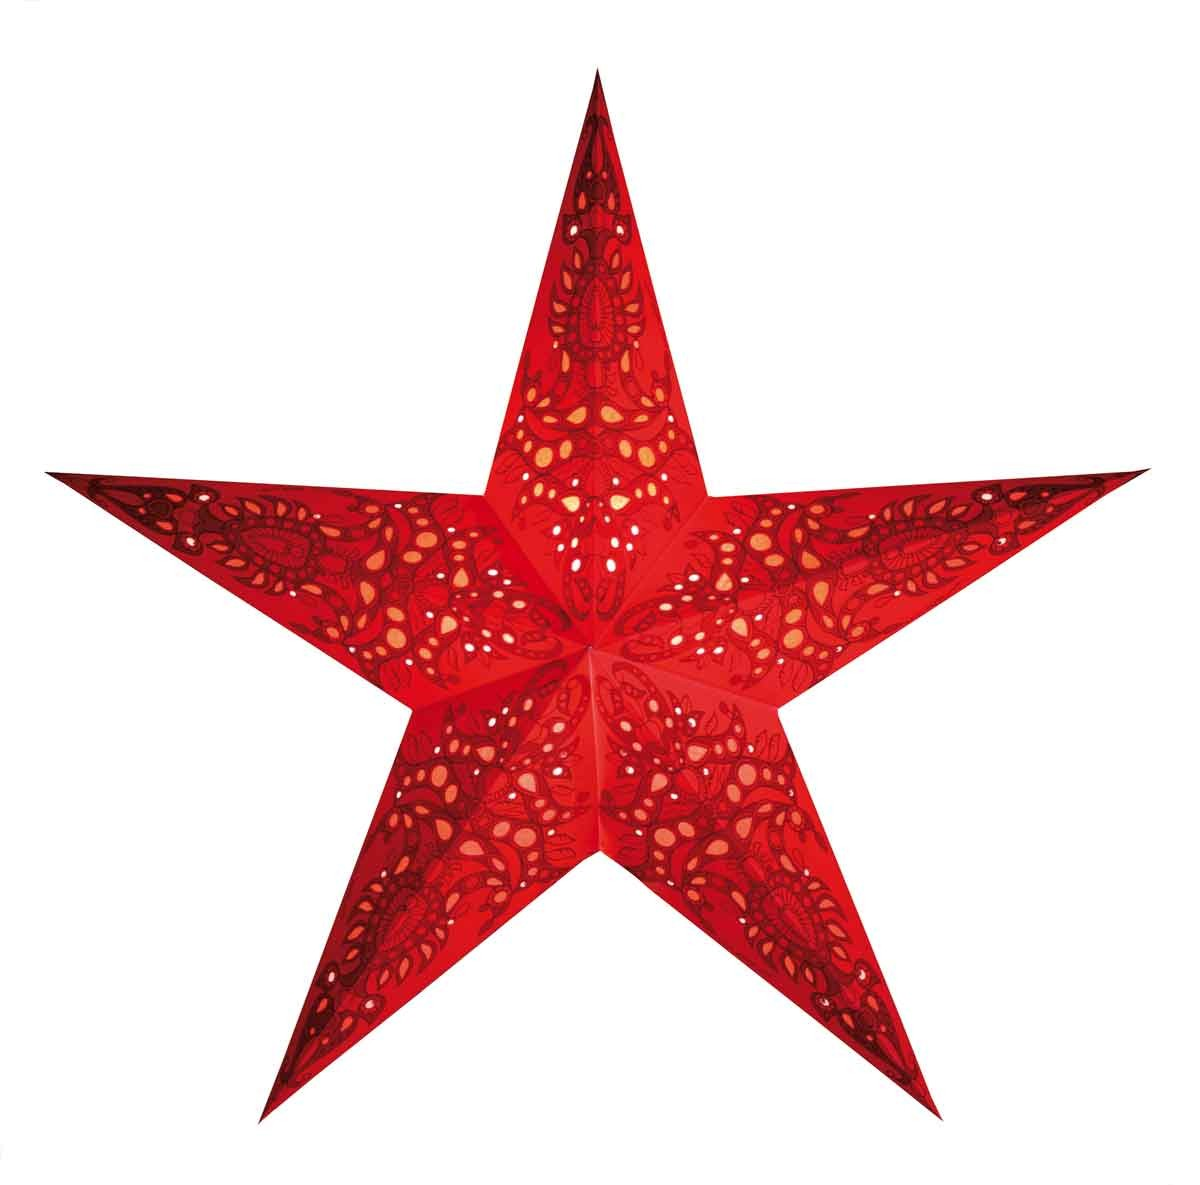 starlightz mono red size M